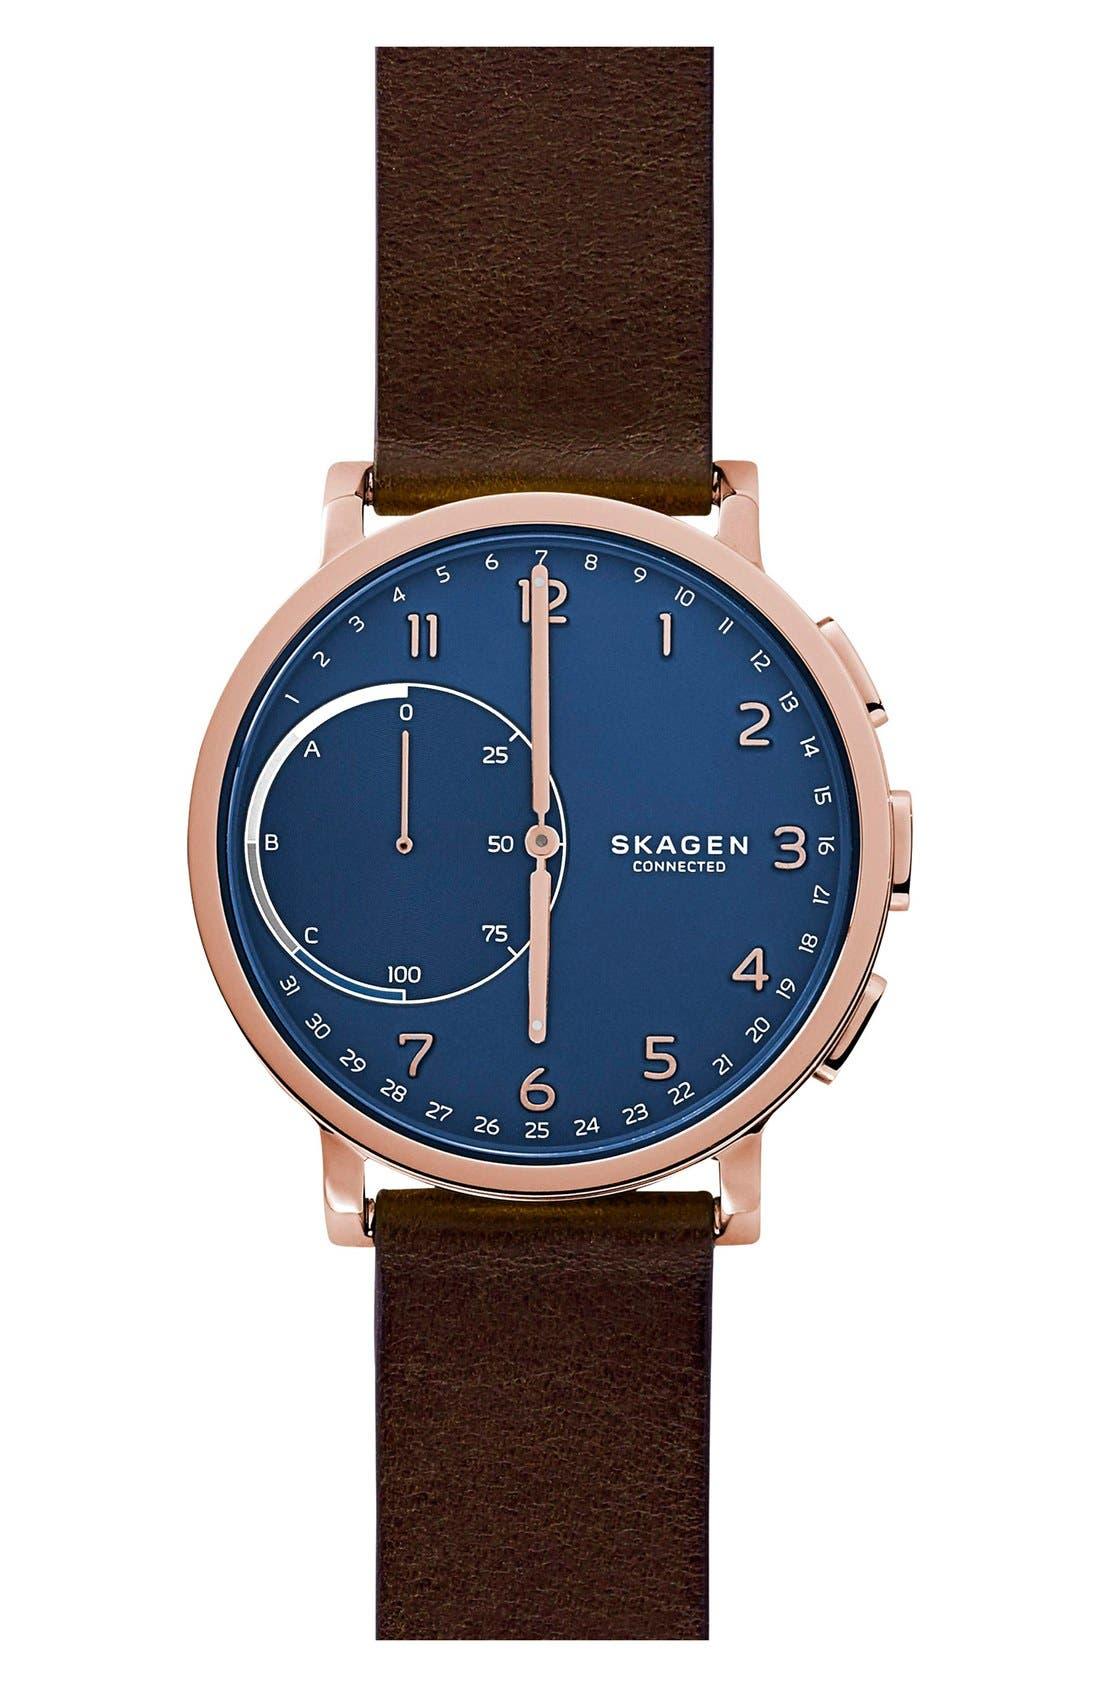 Skagen Hagen Connected Hybrid Smart Watch, 42mm